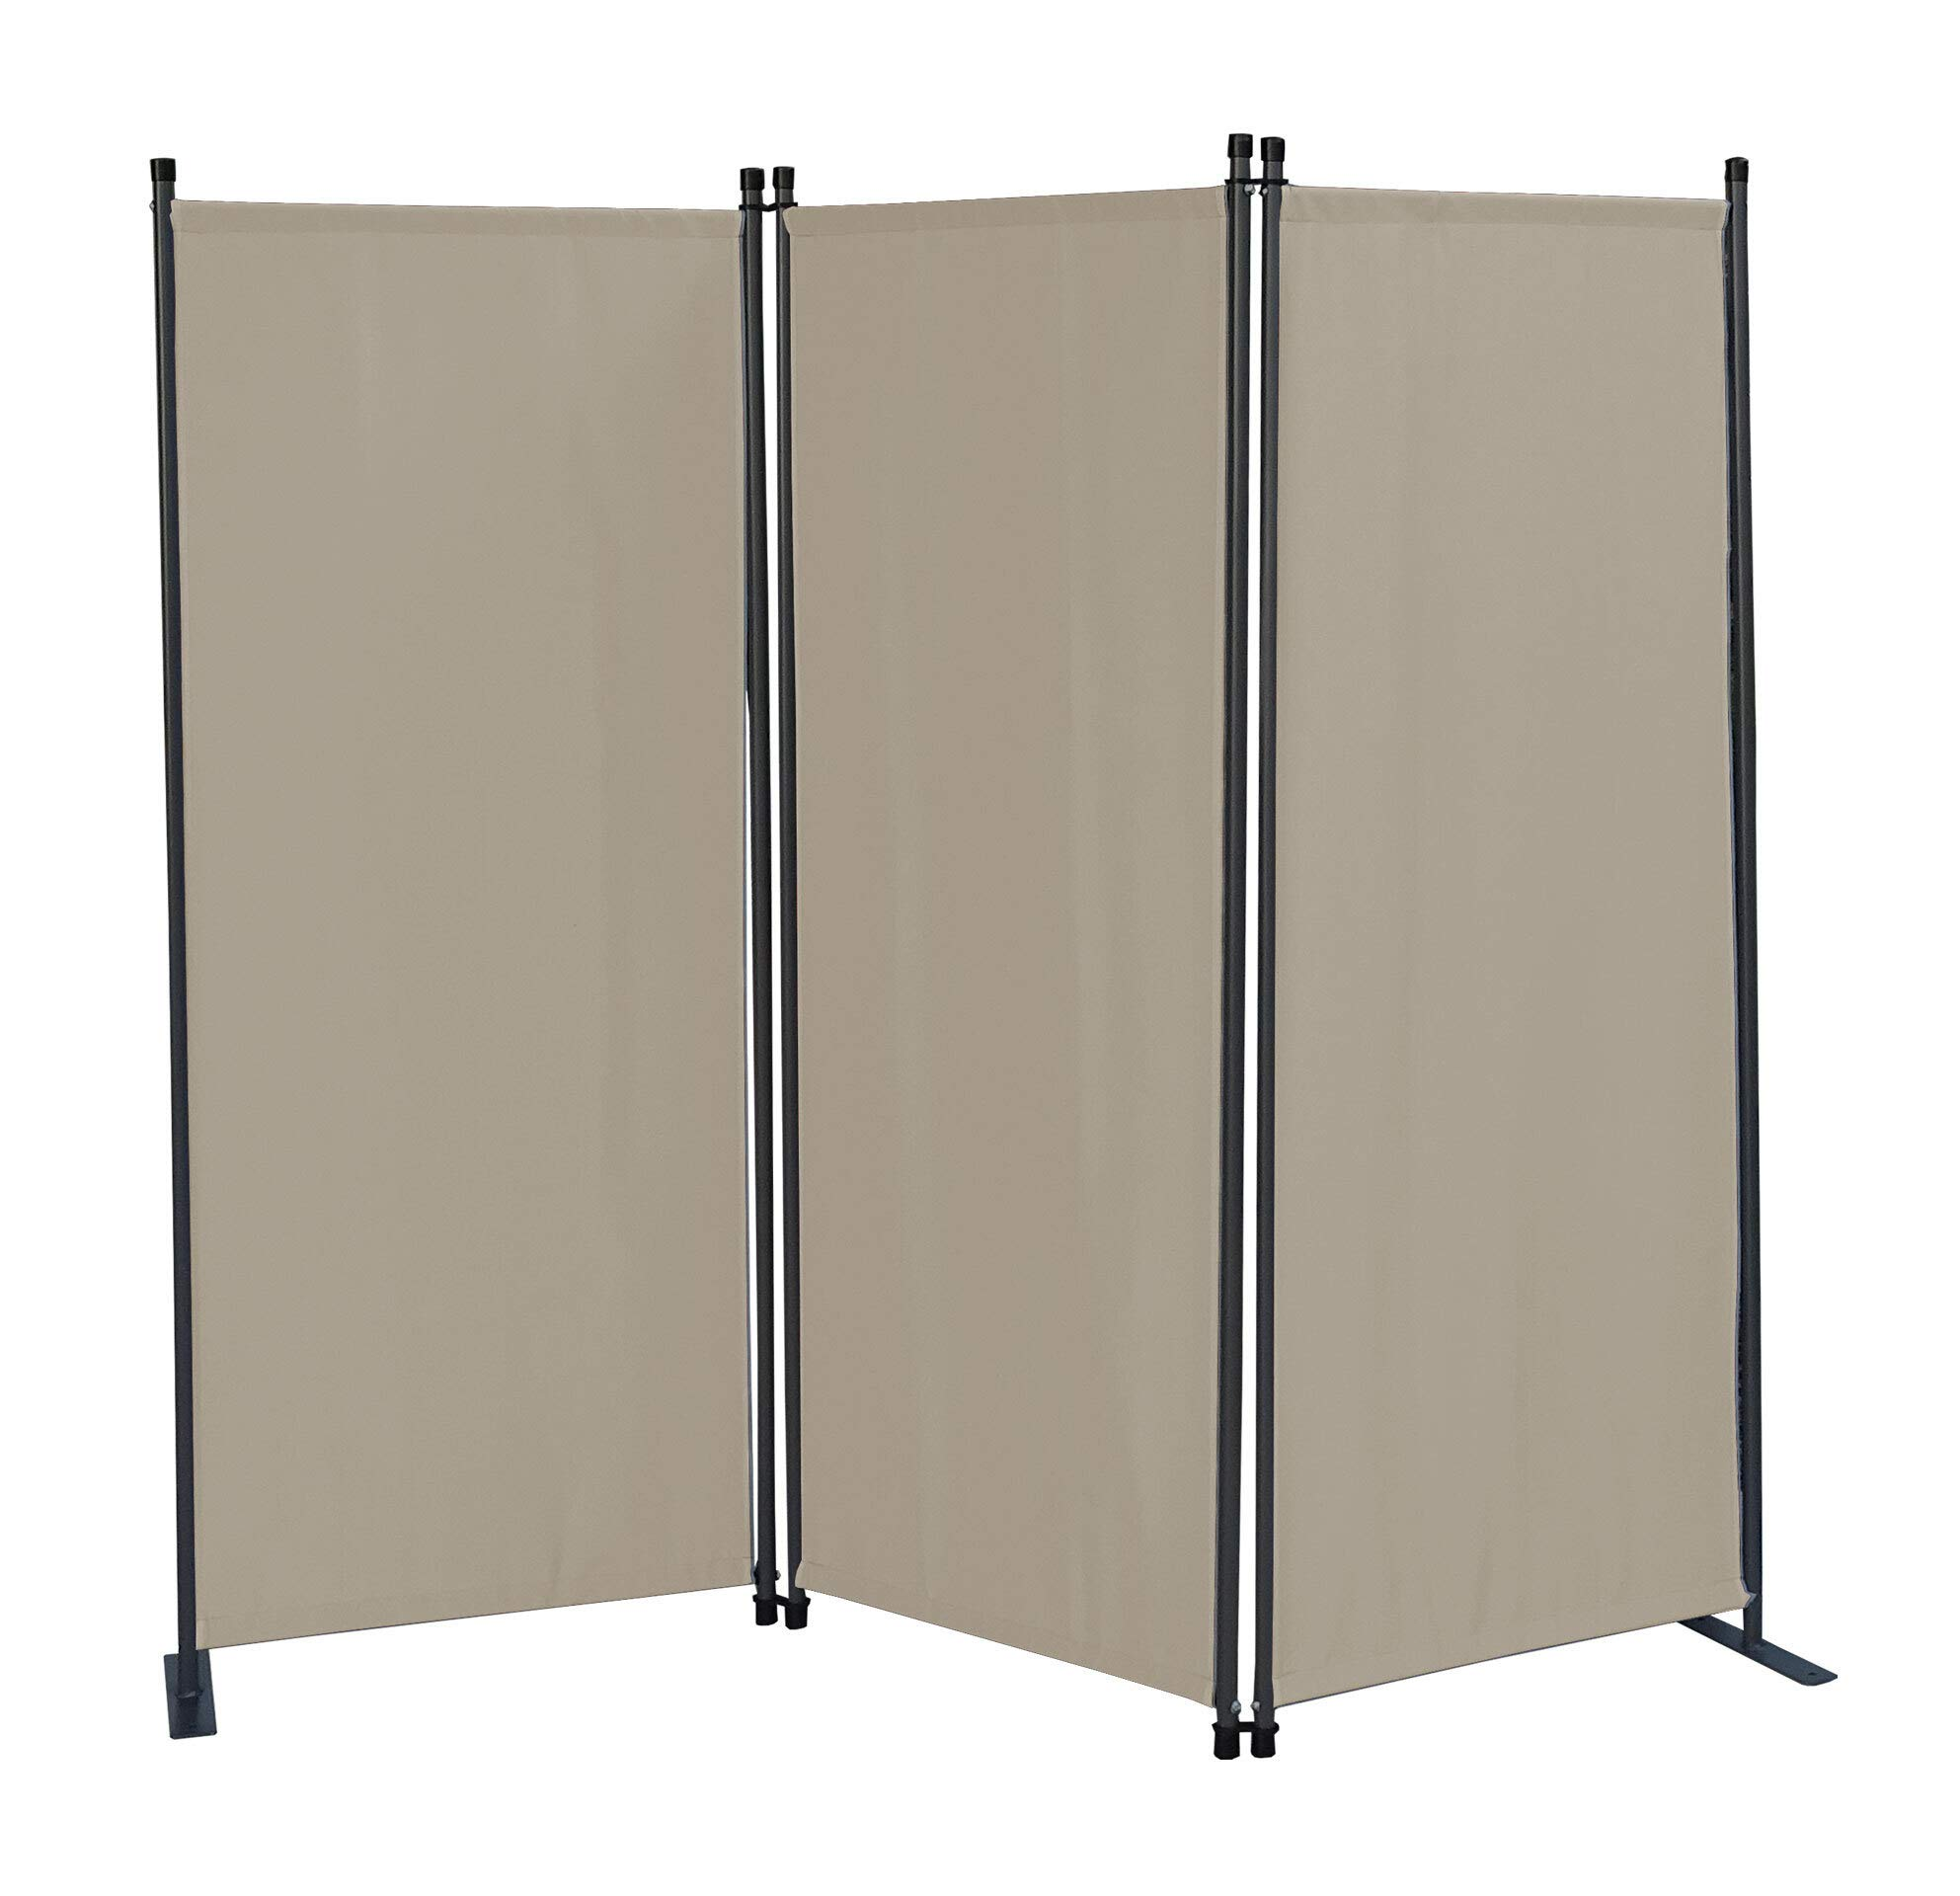 Quick Star 3 Piece Screen 170 x 165 cm Fabric Room Divider Garden Divider Balcony Privacy Screen Folding Grey